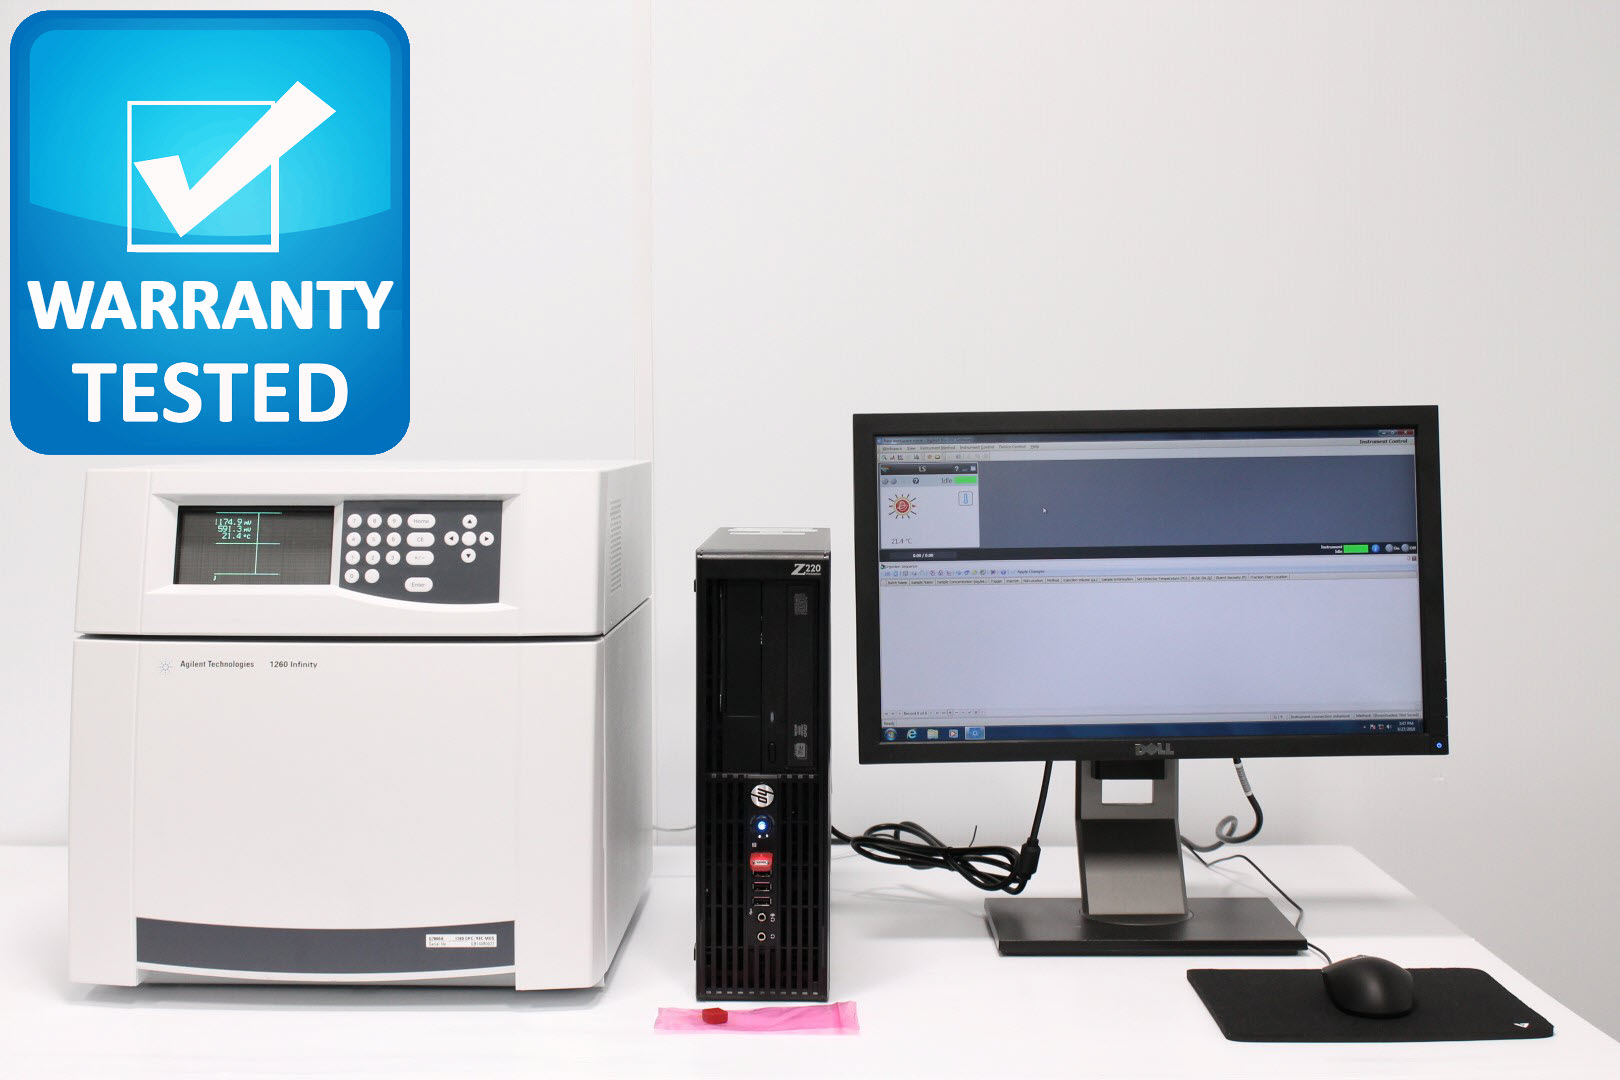 Agilent 1260 Infinity G7800A GPC/SEC Control Module w Bio-Sec Software